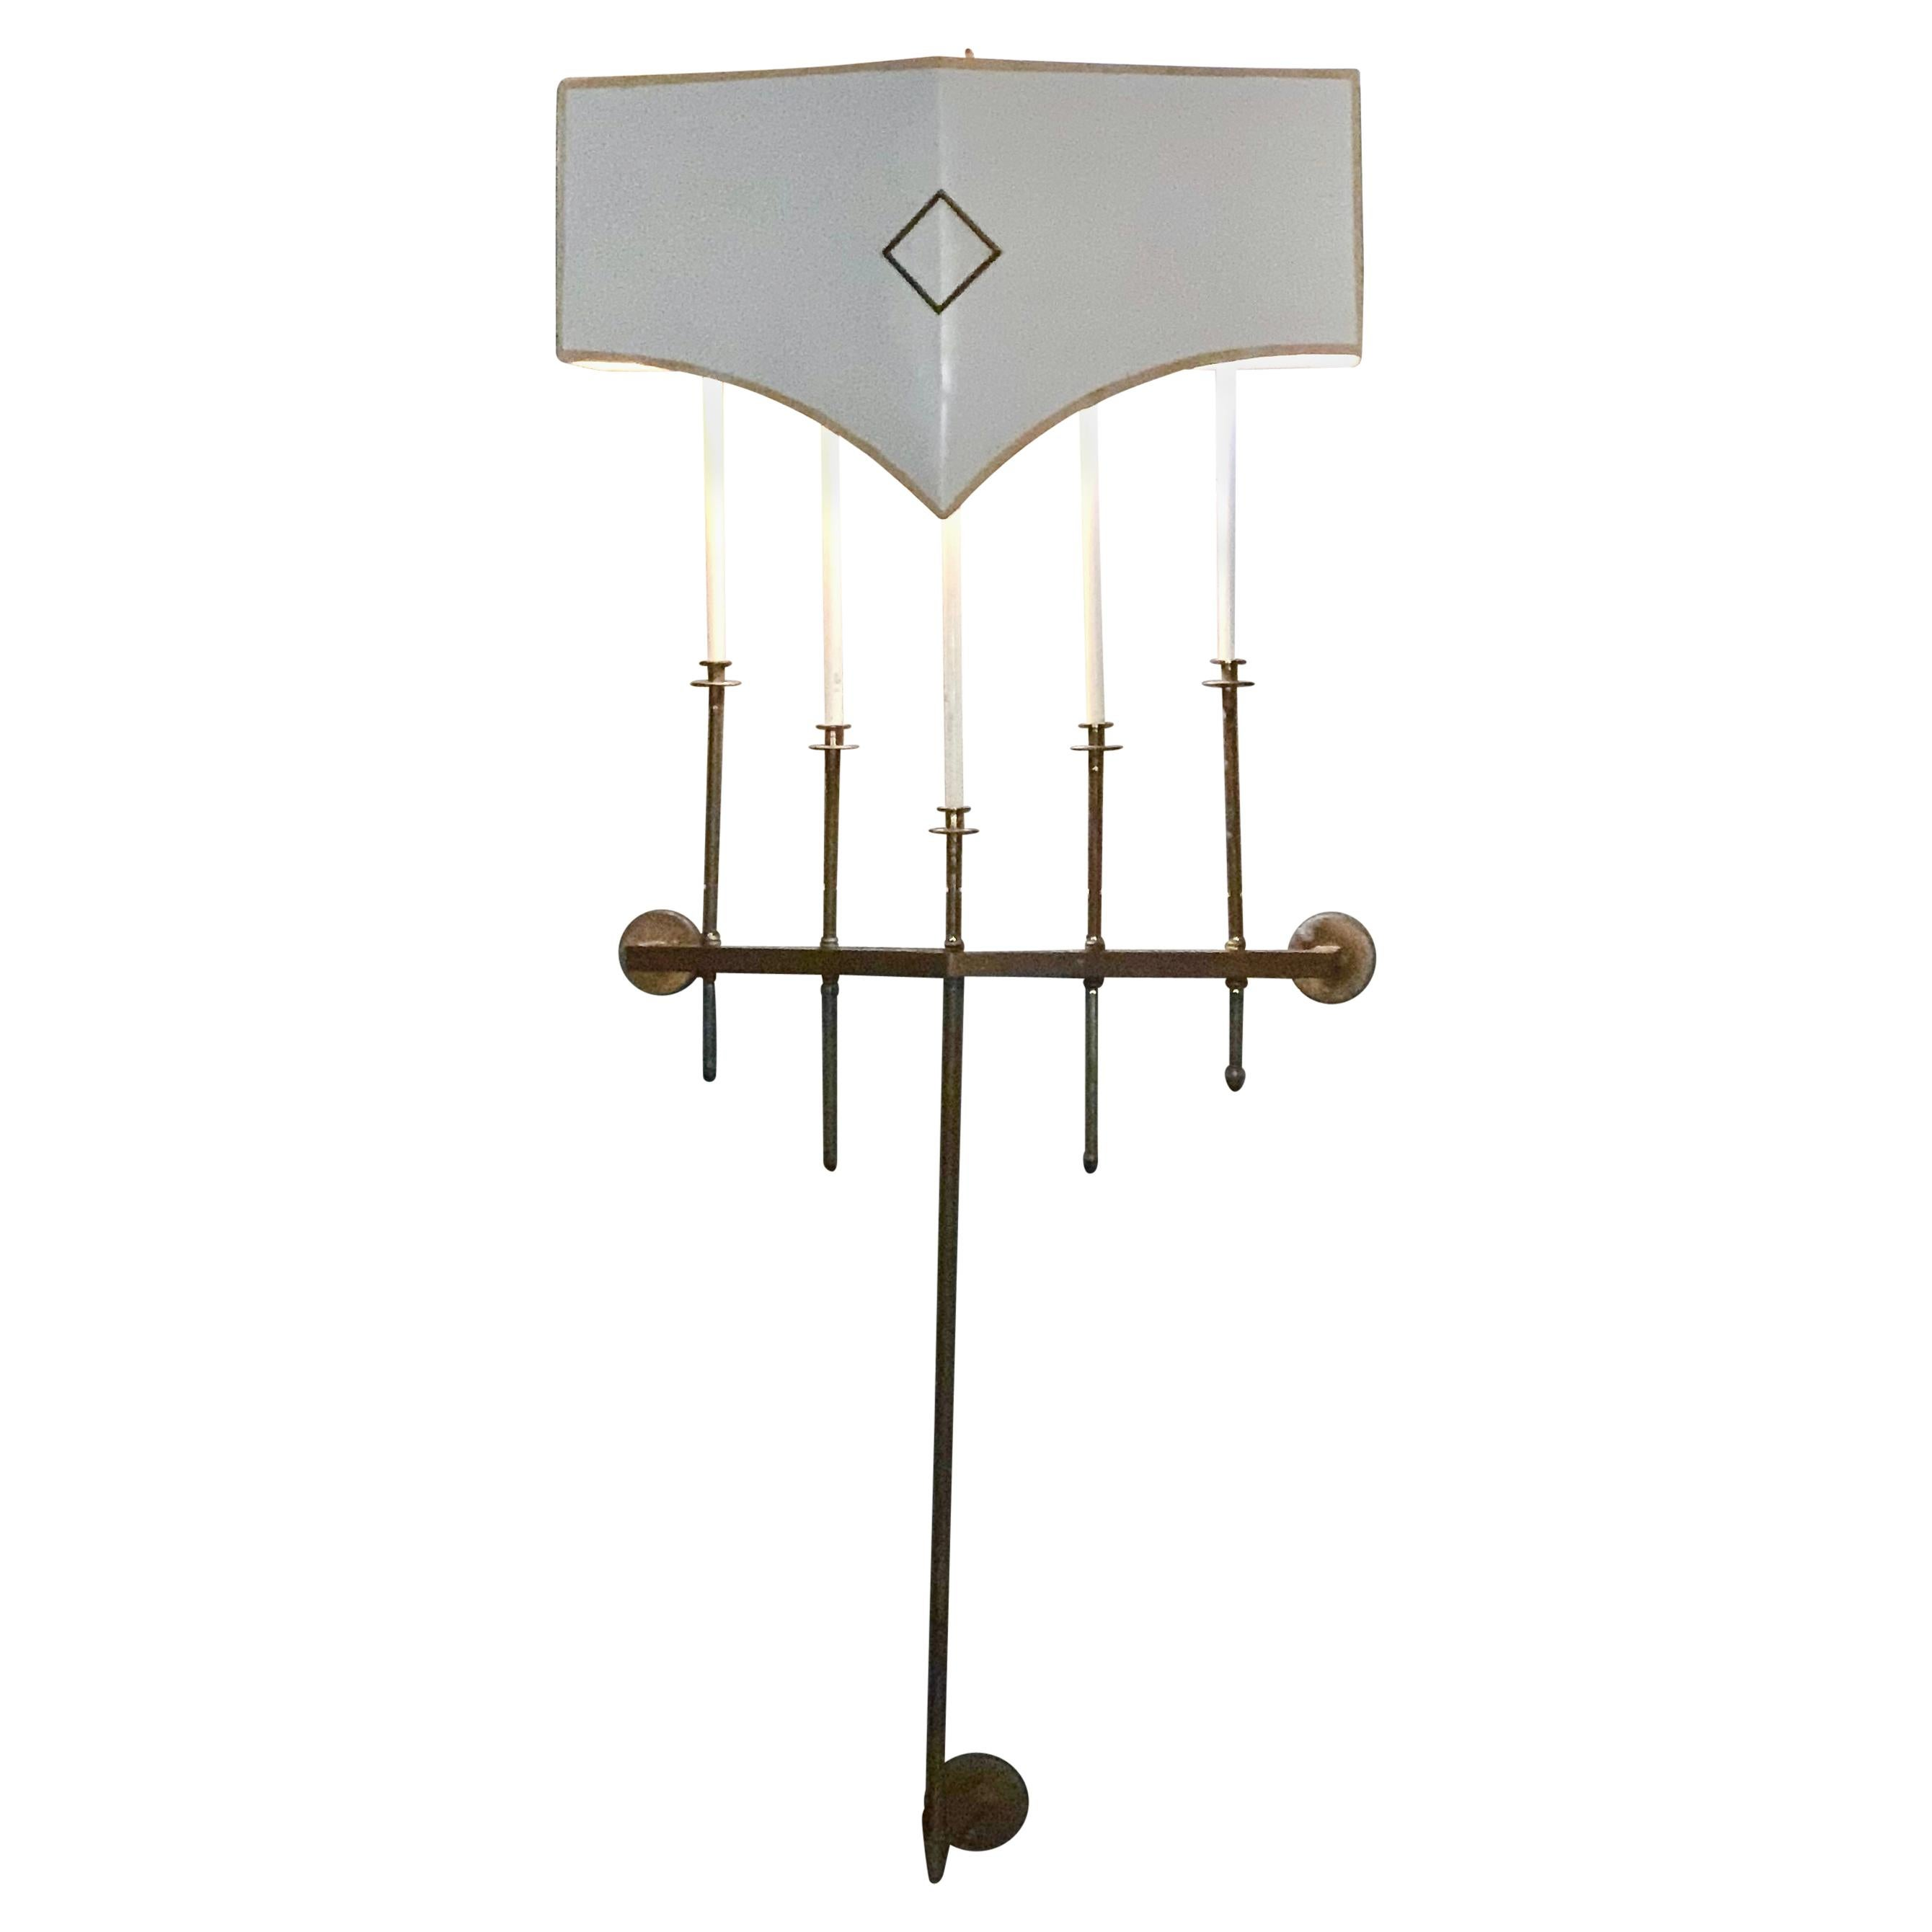 Tommi Parzinger Brass Wall Light Fixture Sconce Candelabra 1950s Modern Regency